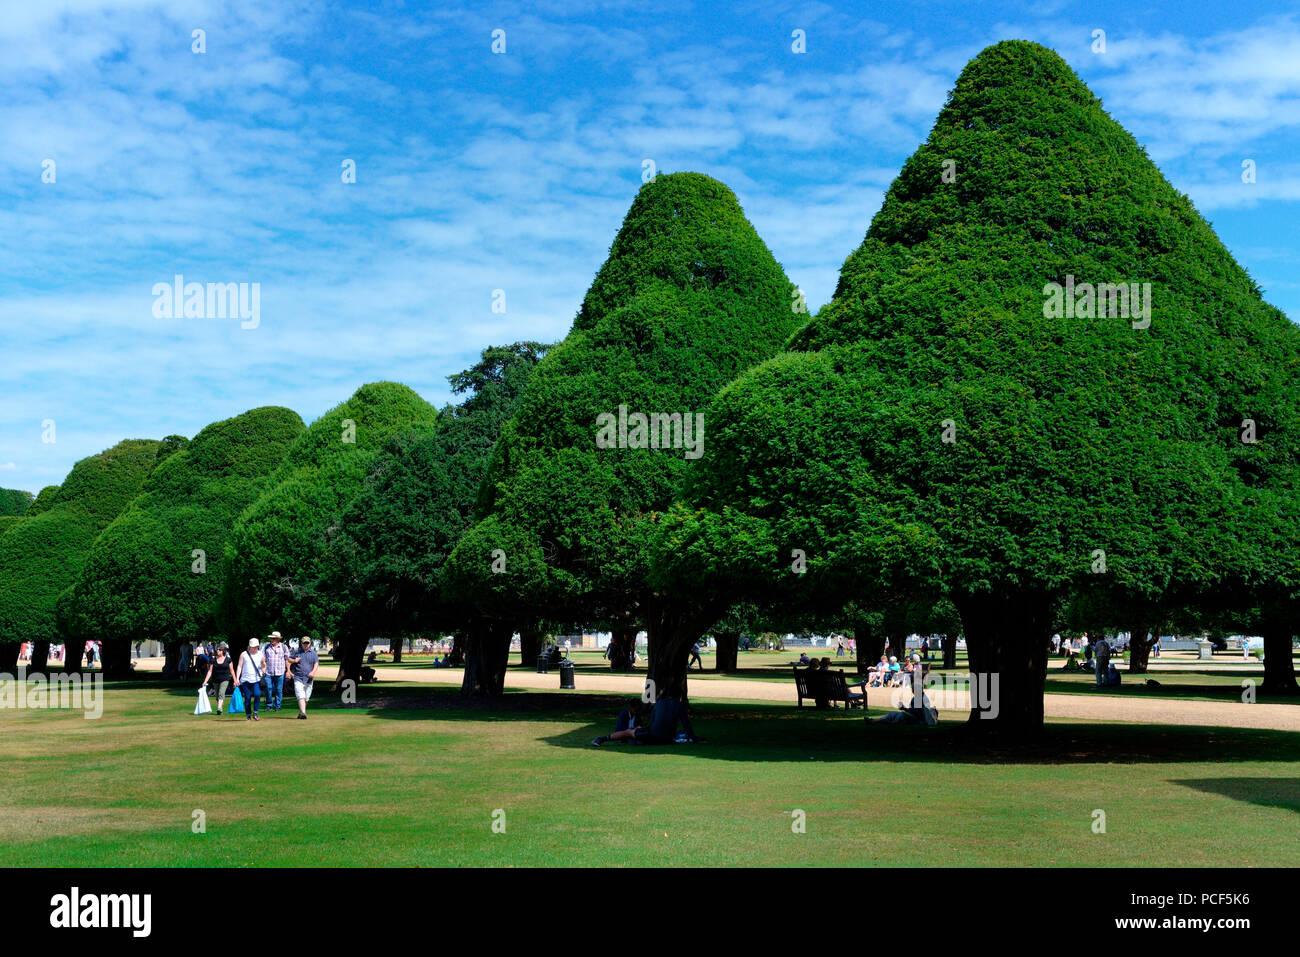 Eiben in Formschnitt, Eibenallee, Taxus baccata, Hampton Court Palace, England, Grossbritannien, Europa, Formschnitteibe Stock Photo